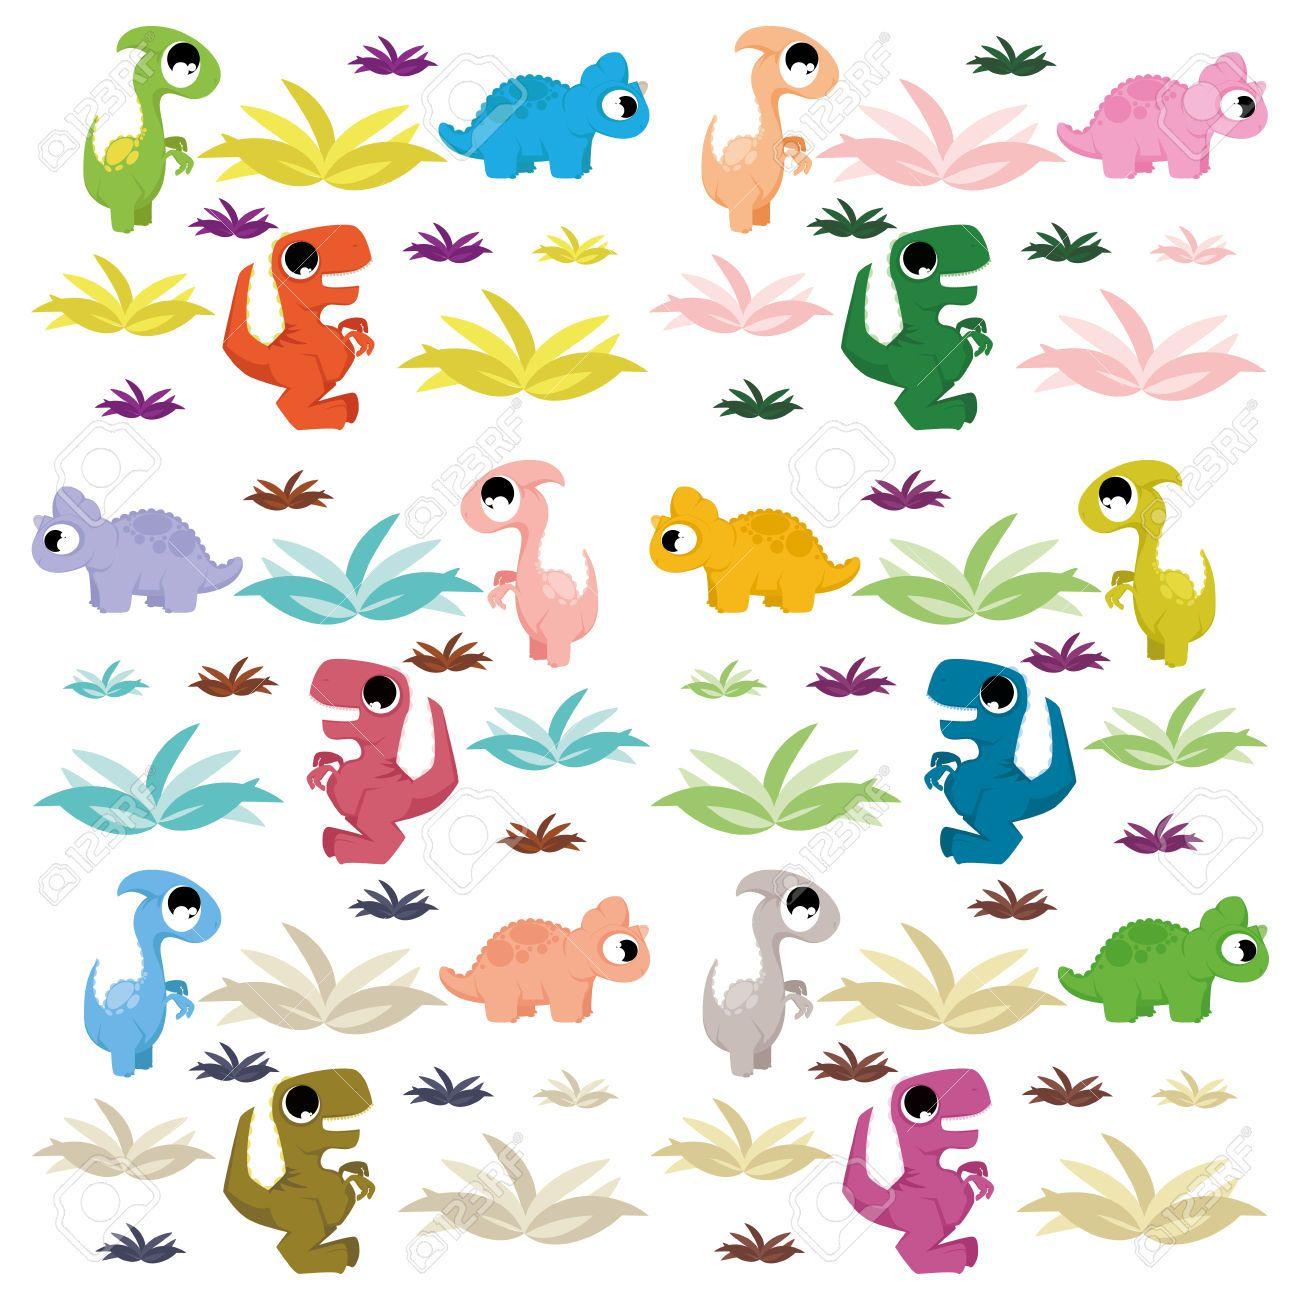 cute dinosaur illustrations - Google Search | Dinosaurs | Pinterest ...